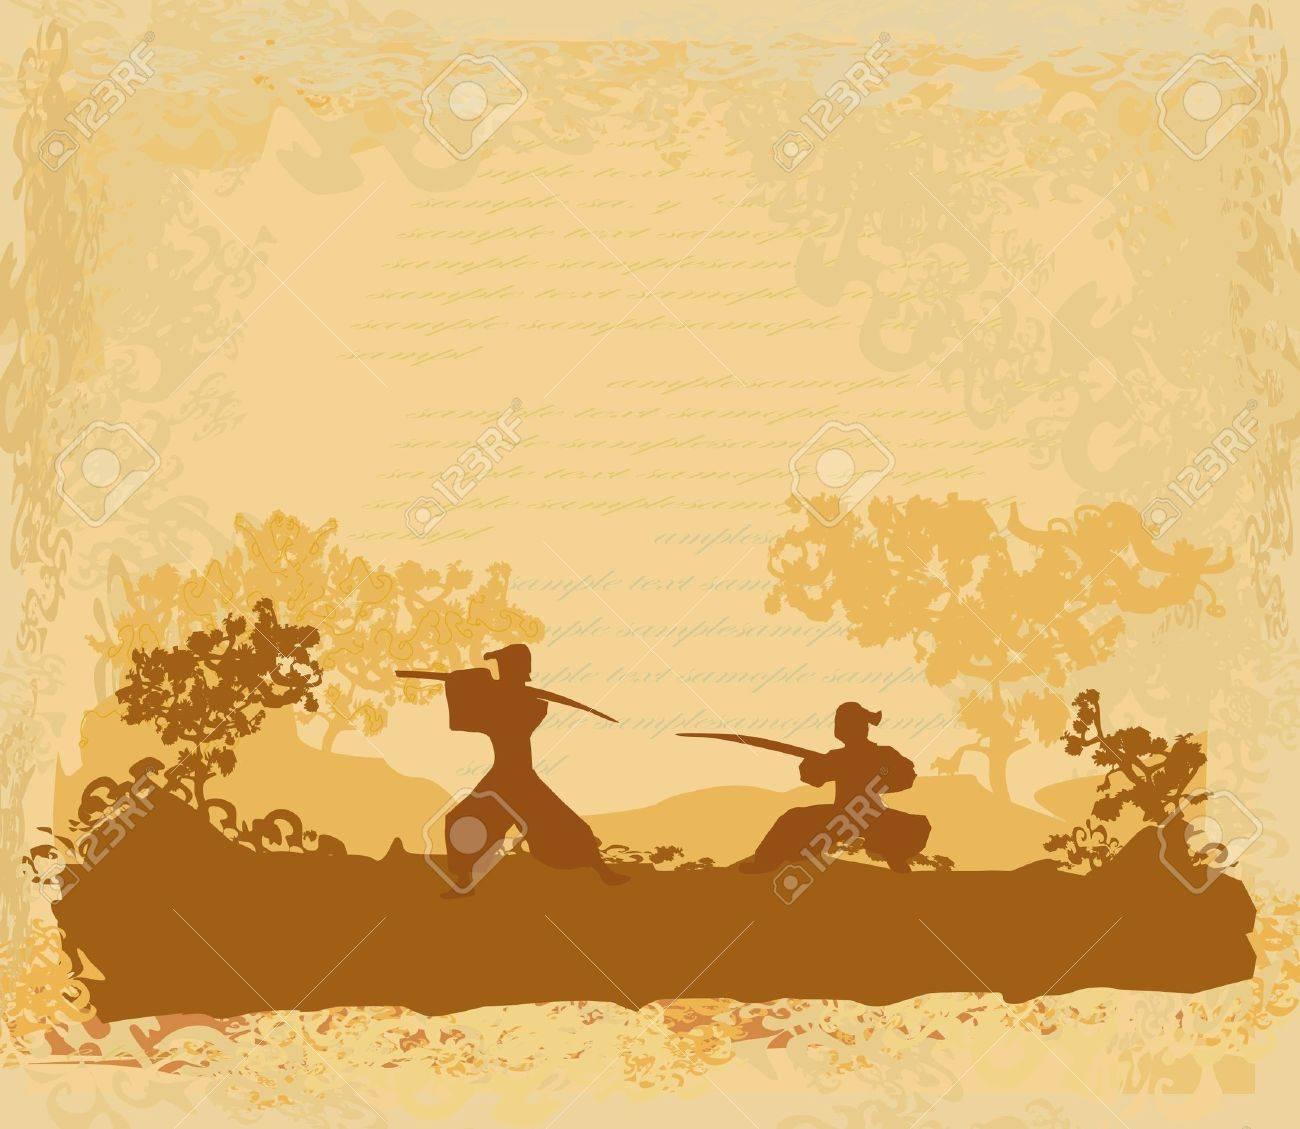 Samurai silhouette in Asian Landscape Stock Vector - 11477343